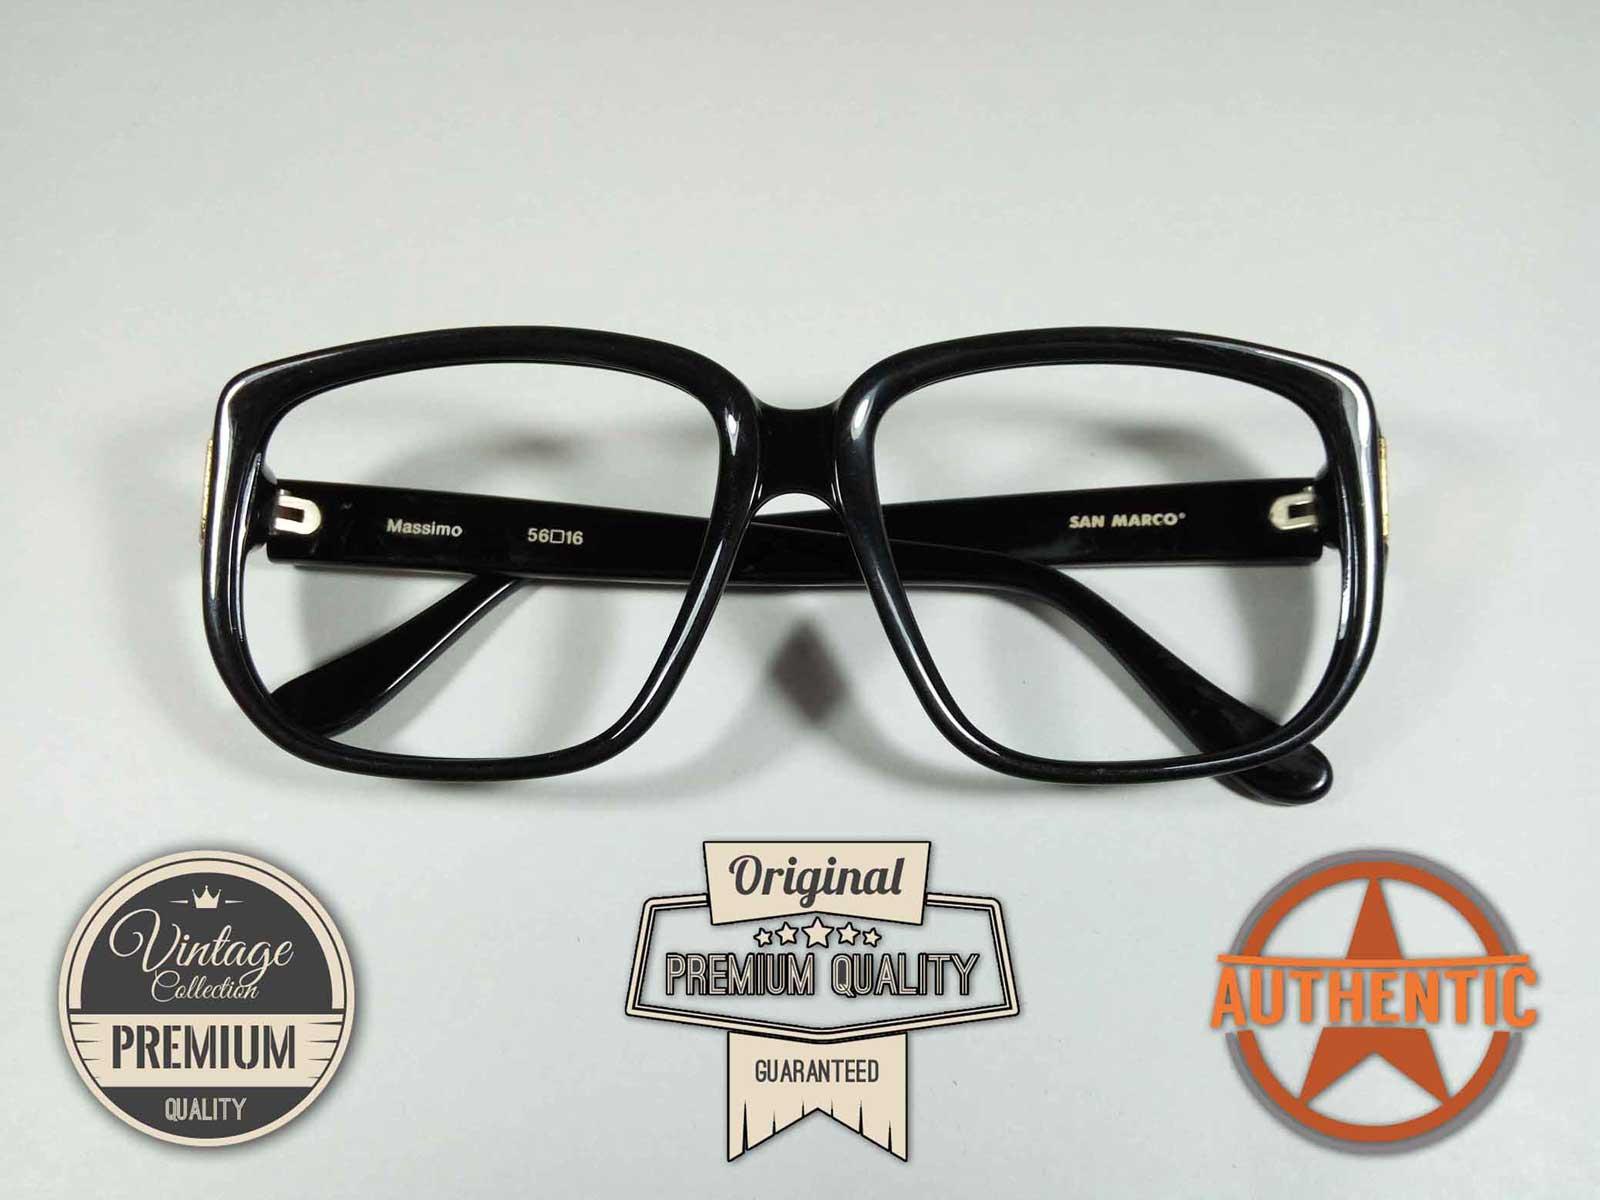 Kacamata Vintage SQUARE KOTAK Jadul Antik Classic Original SANMARCO MASSIMO  310 BLACK 1f9a0f7f2f